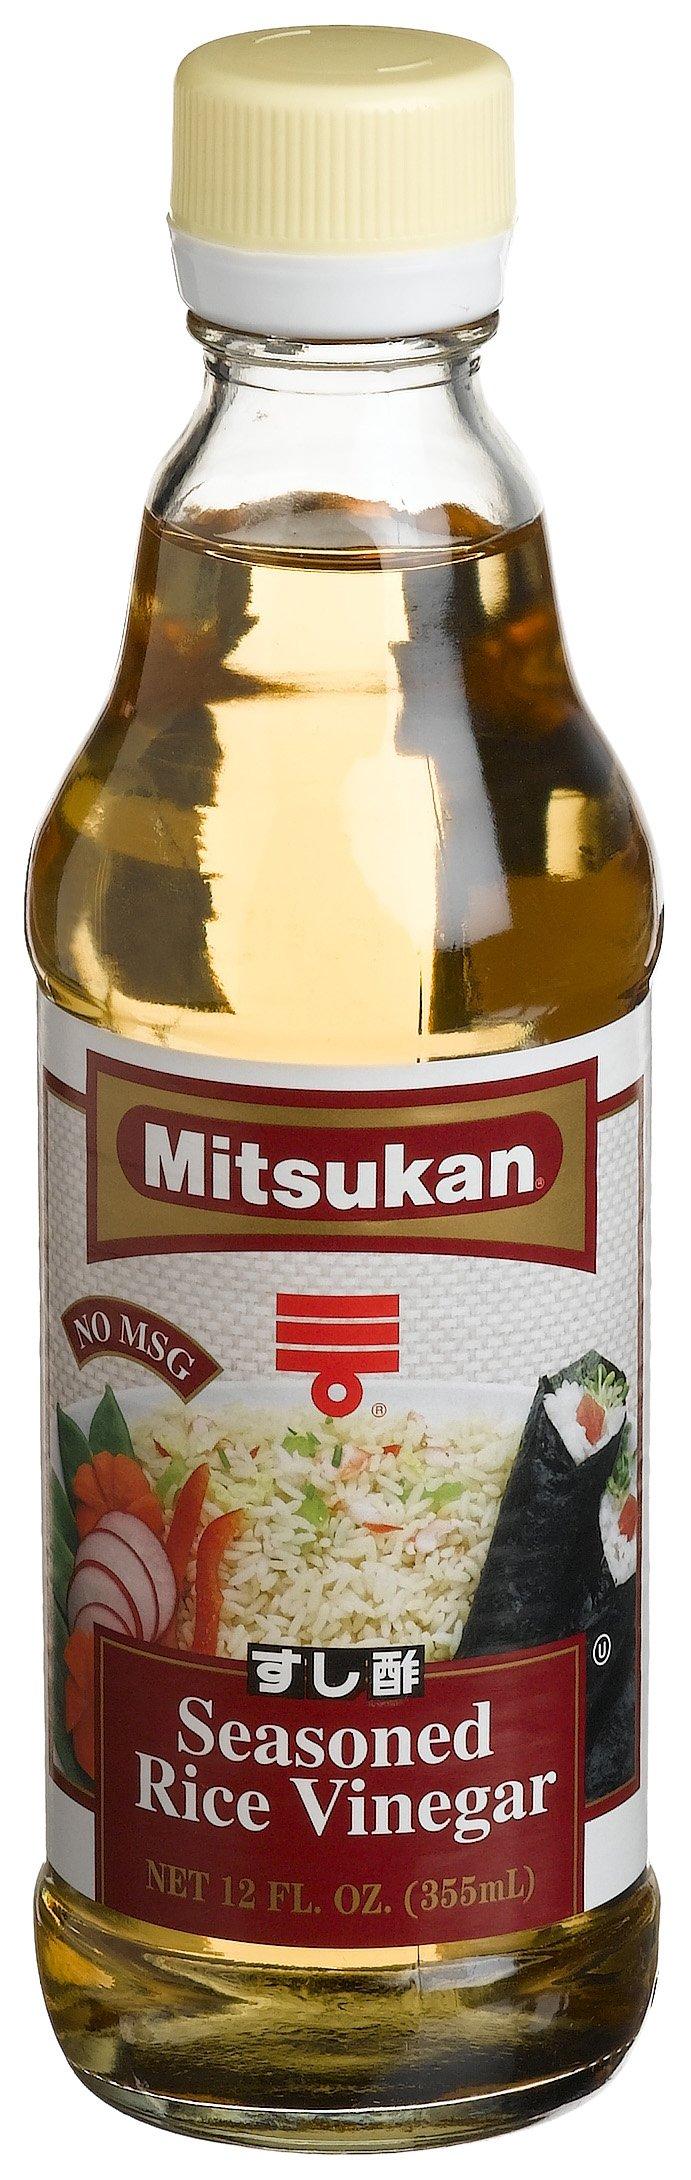 Mitsukan Seasoned Rice Vinegar, 12-Ounce Bottles (Pack of 6) by Mitsukan